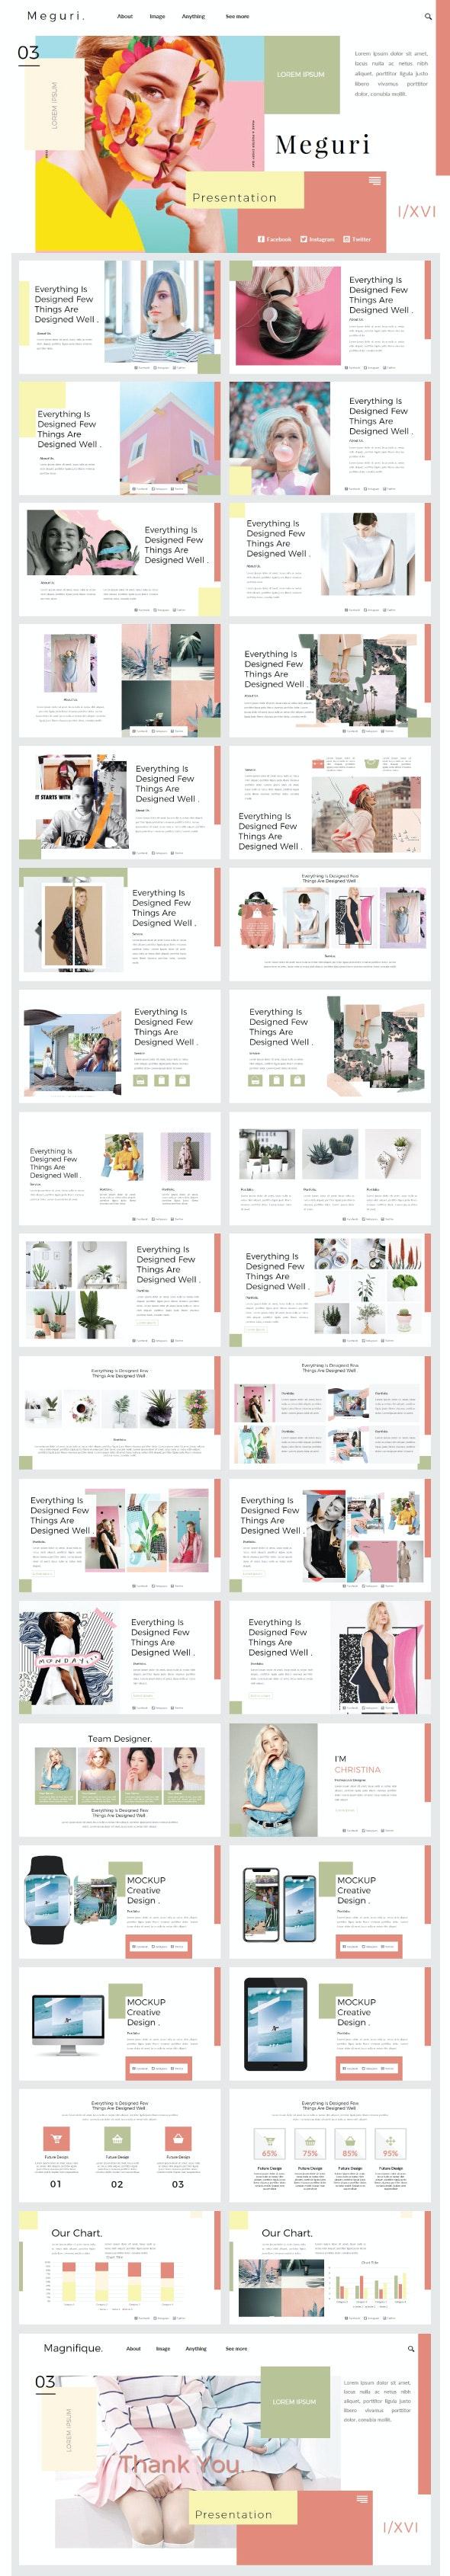 Meguri Presentation Template - Creative PowerPoint Templates